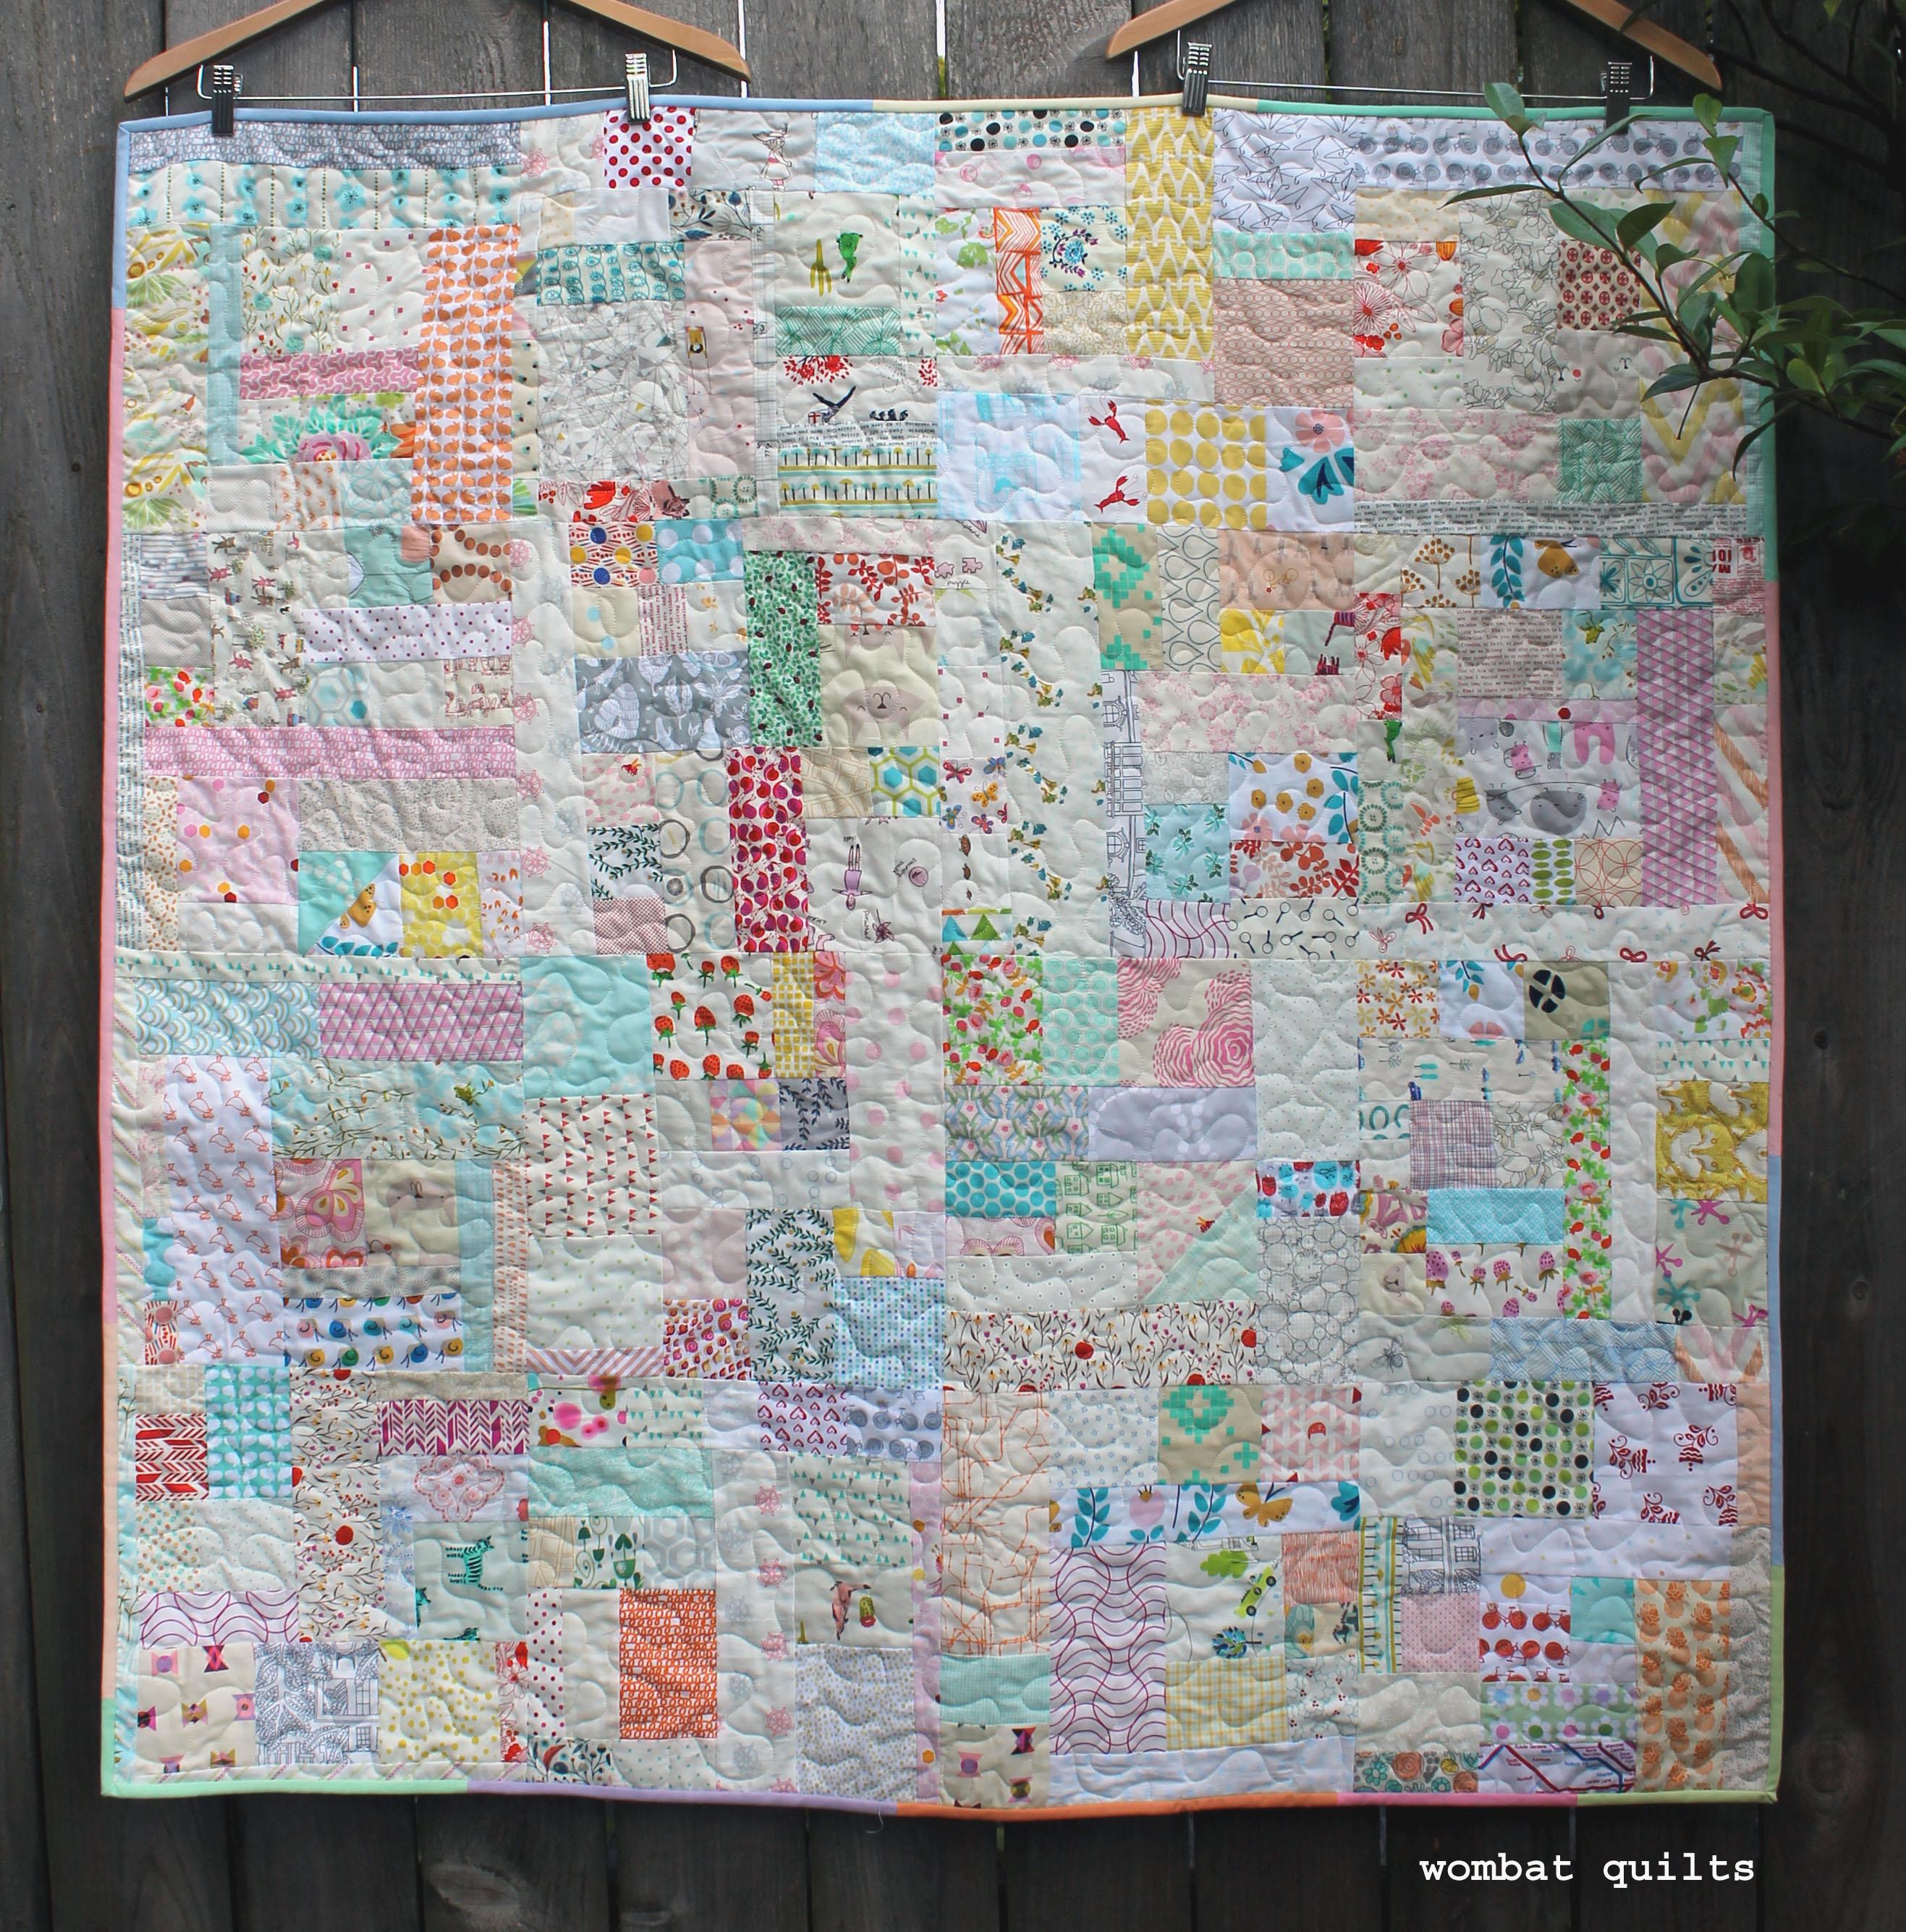 Scrap vortex quilt wombat quilts for Scrap quilt